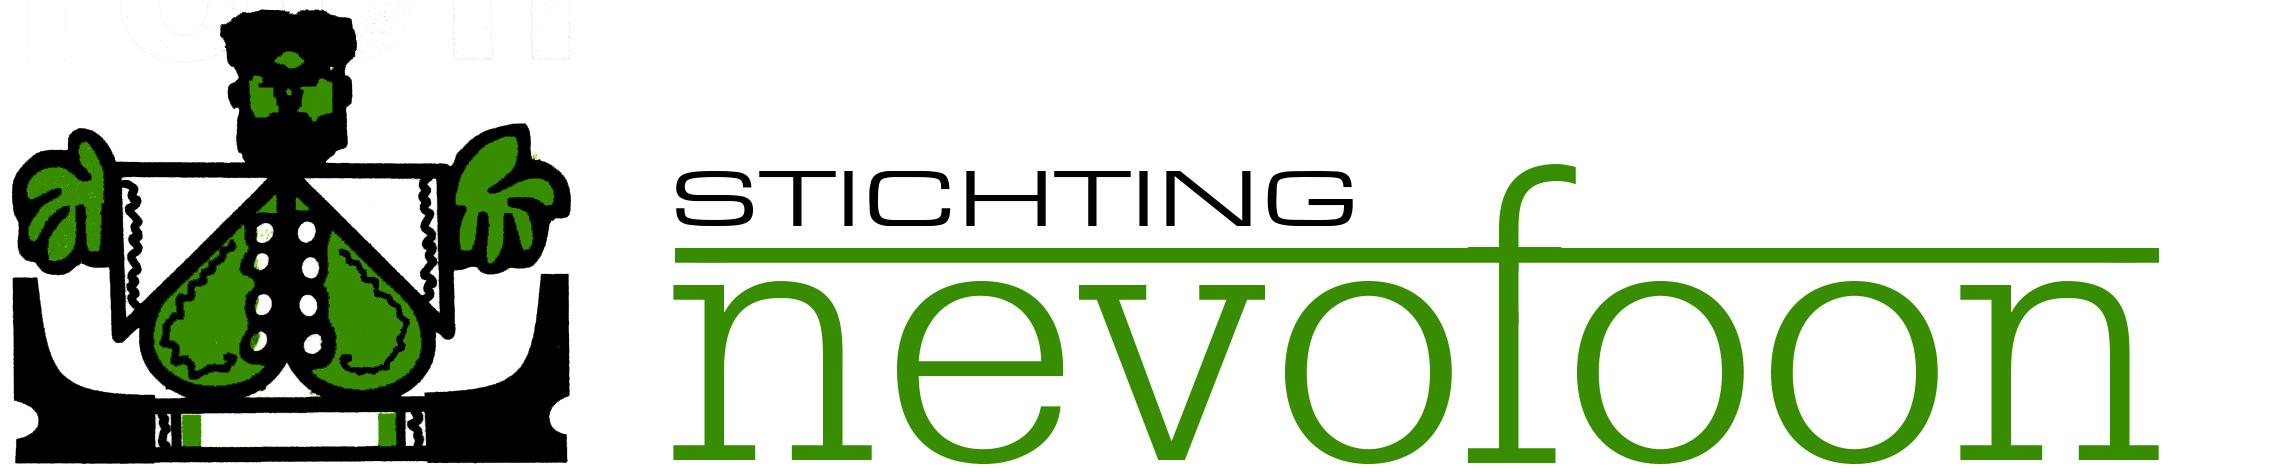 Stichting Nevofoon